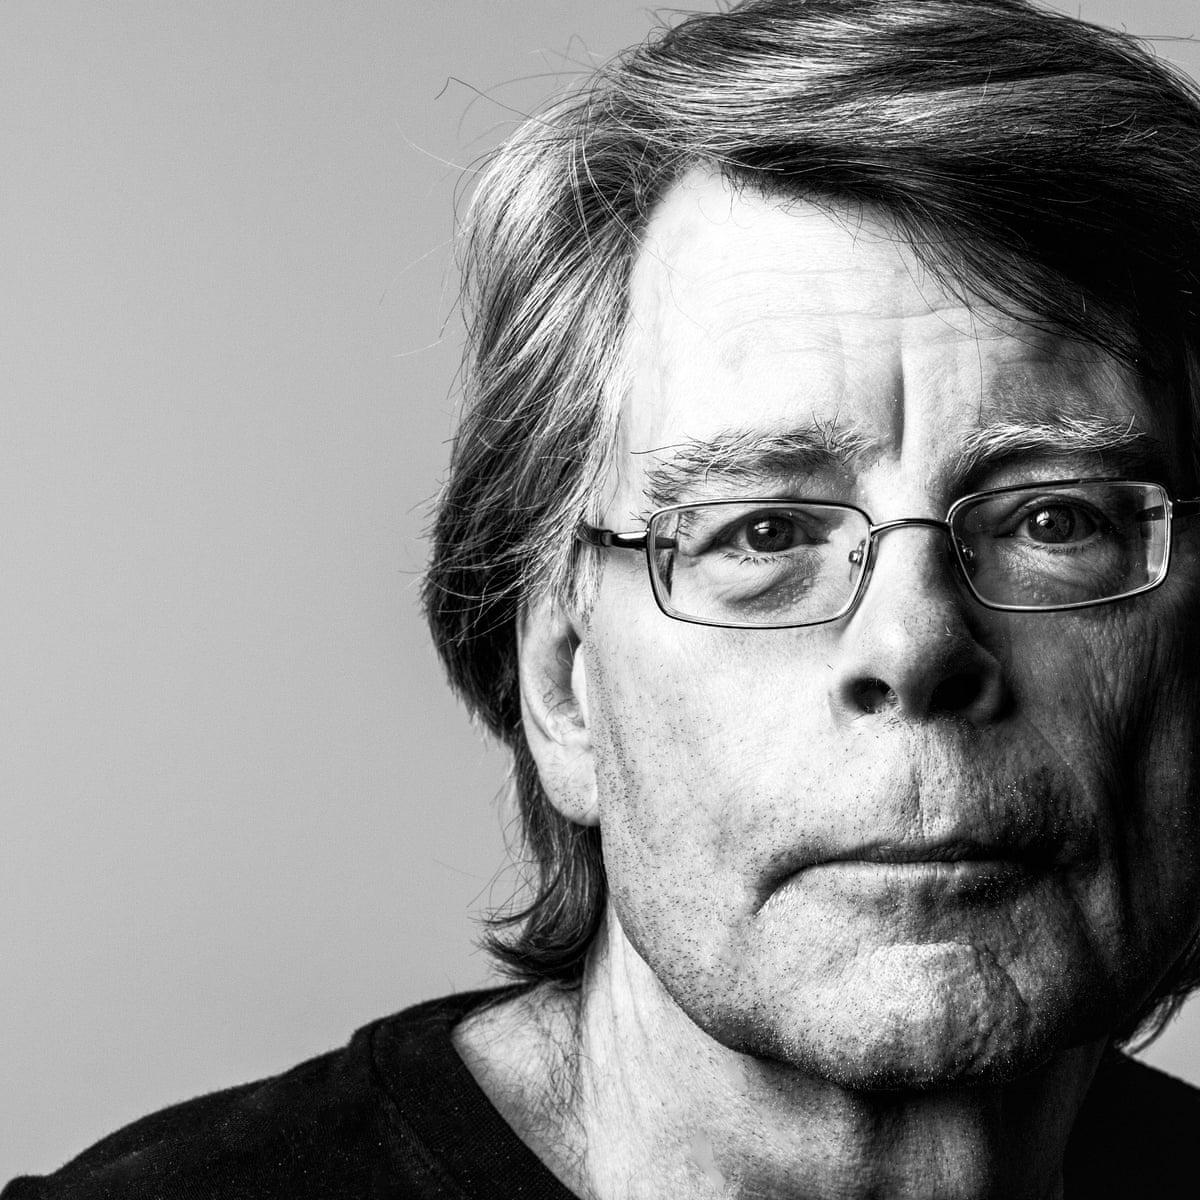 Alcoholic Writers: 9 Influential Authors Who Battled Addiction